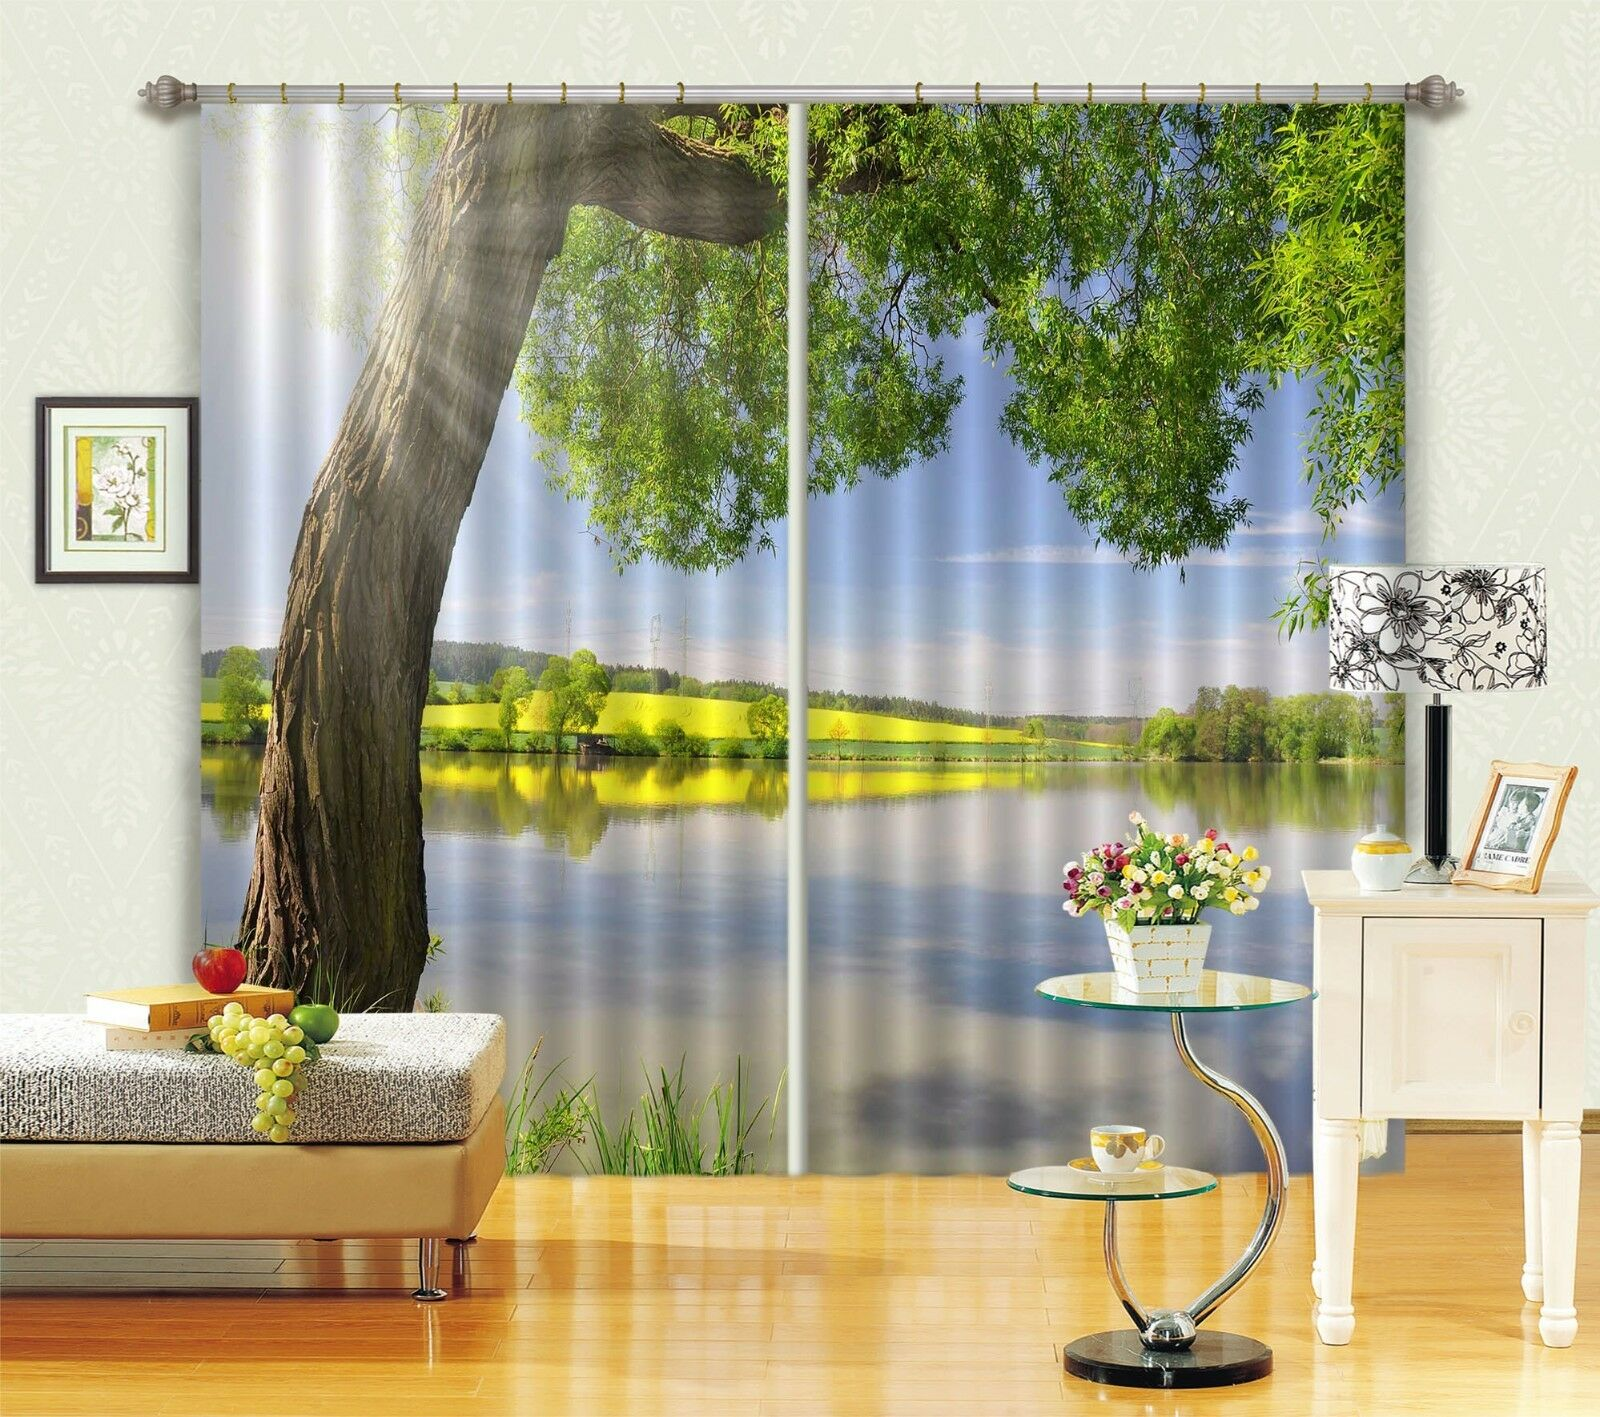 3D Árbol Lago 12 Cortinas de impresión de cortina de foto Blockout Tela Cortinas Ventana au